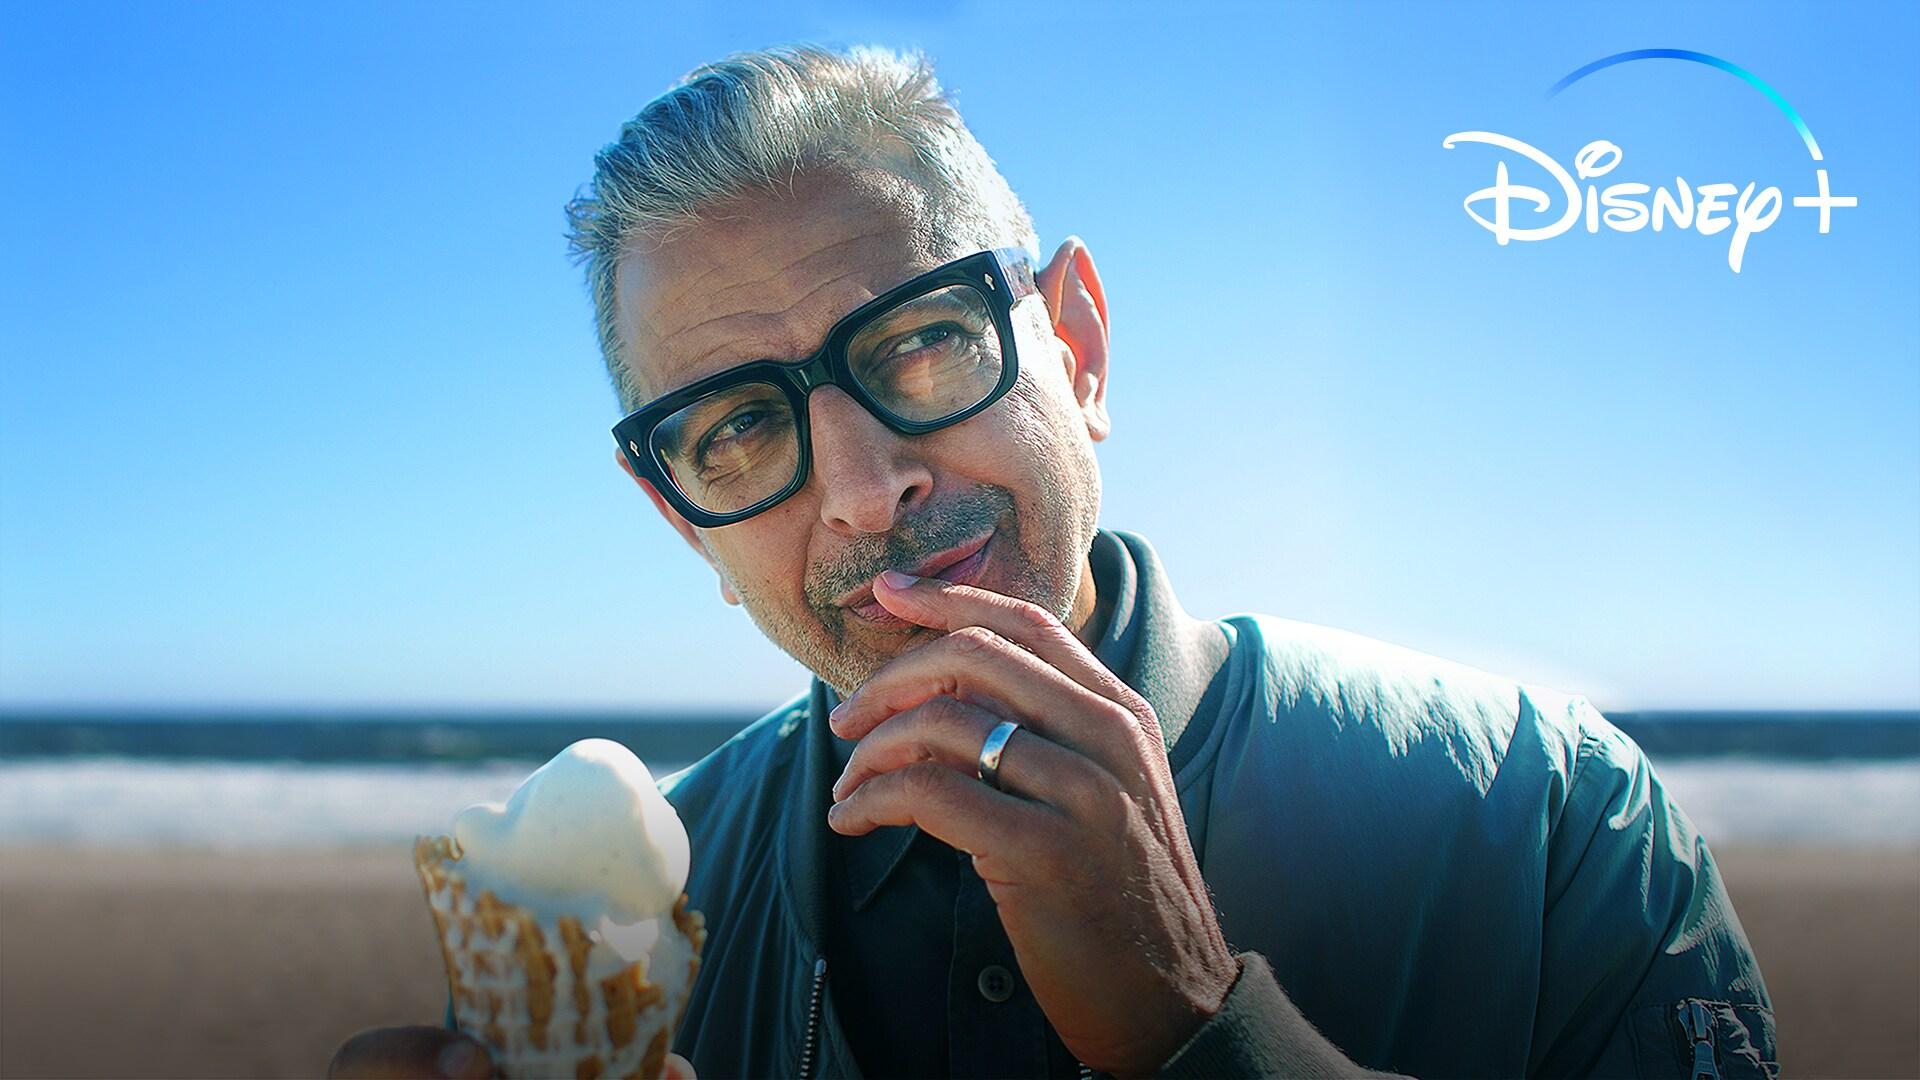 Jeff Goldblum According to the World | Disney+